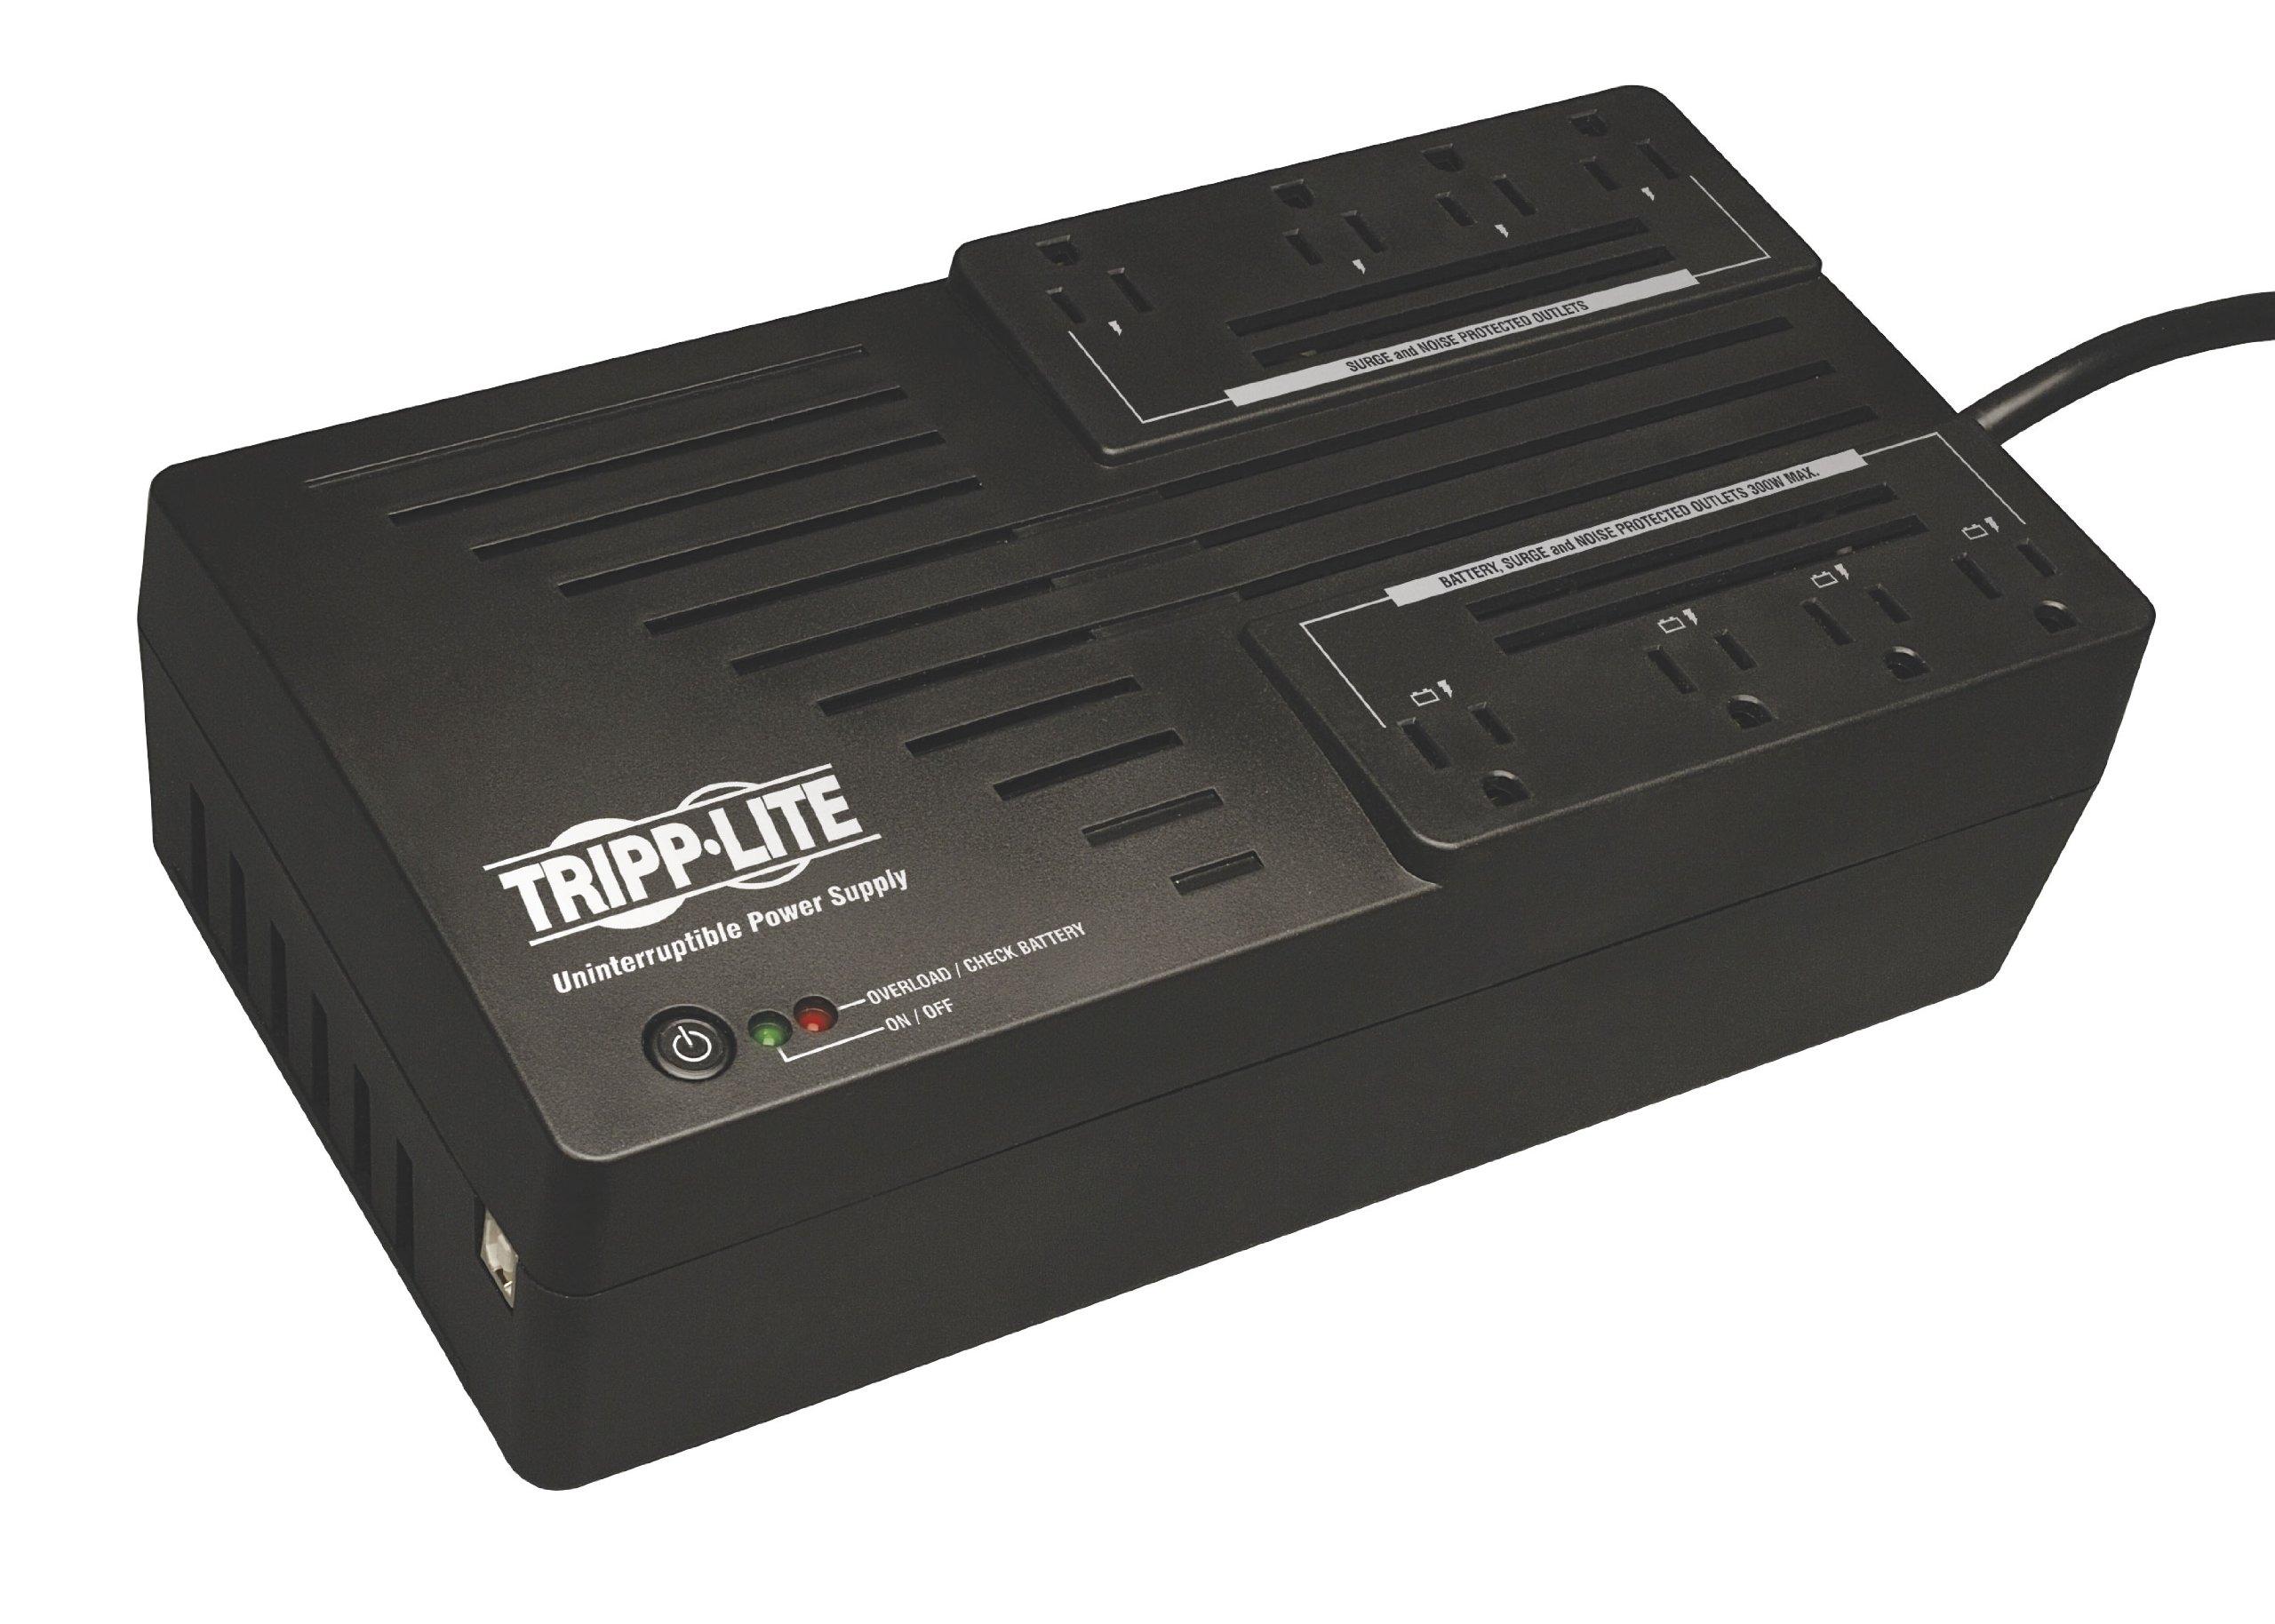 Tripp Lite 700VA UPS Battery Backup, 350W AVR Line Interactive, USB, Ultra-Compact (AVR700U) by Tripp Lite